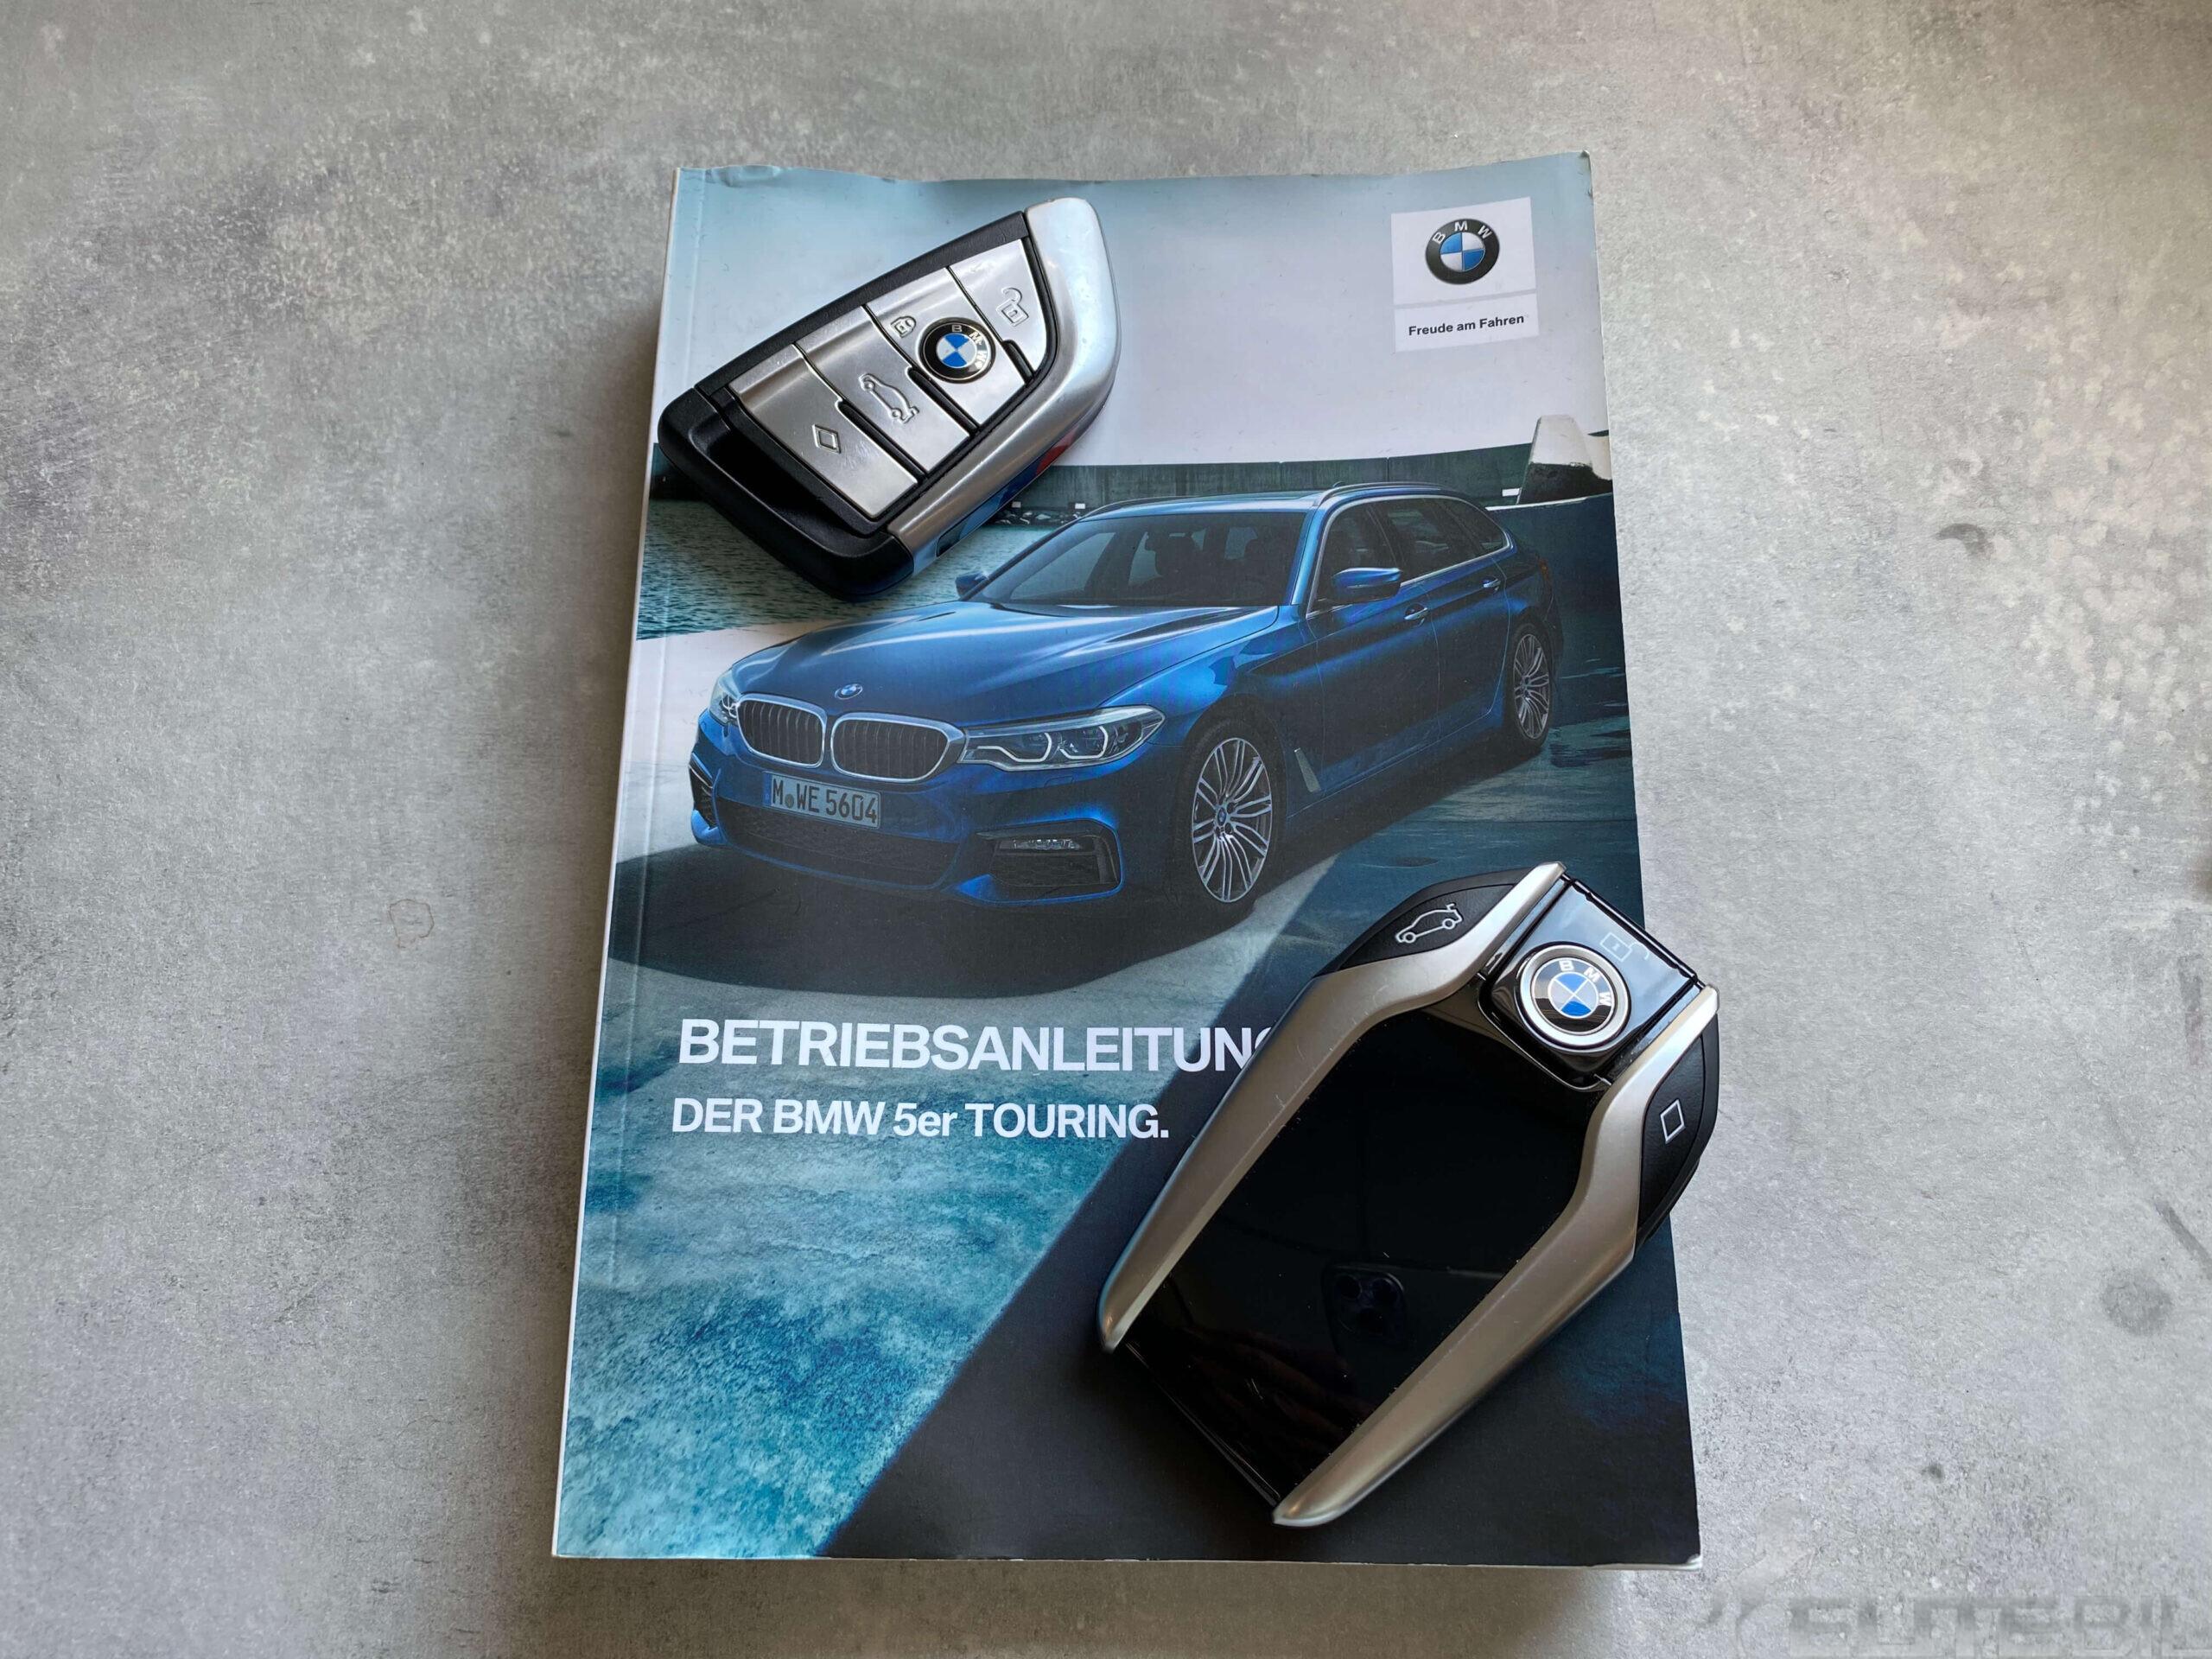 BMW M550 d xDrive G31 Drag-Panorama-HUD Soft Close m.m (24)